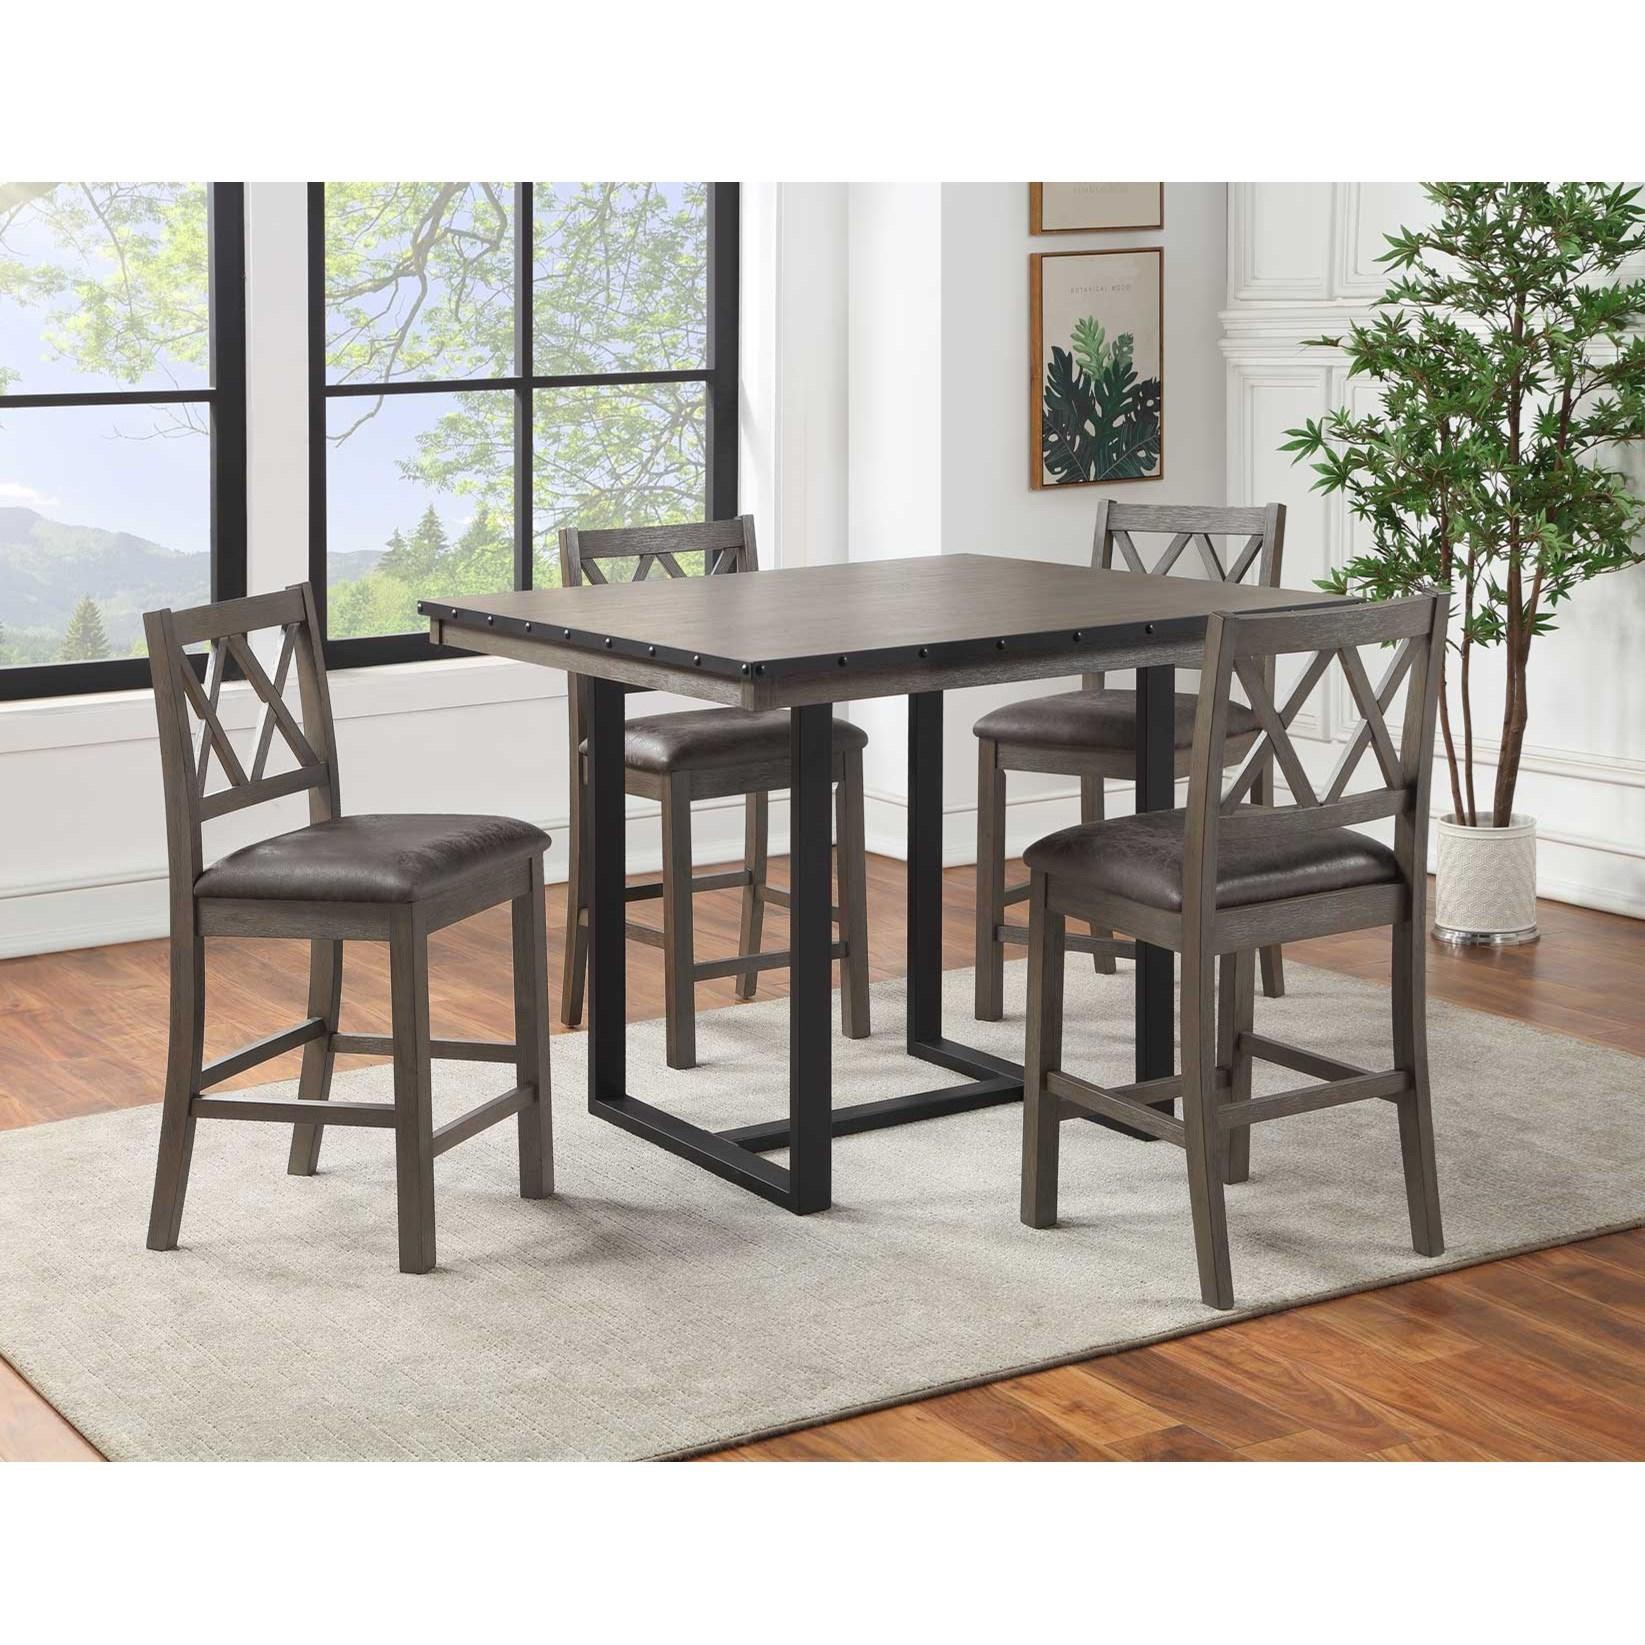 5-Piece Counter Dining Set